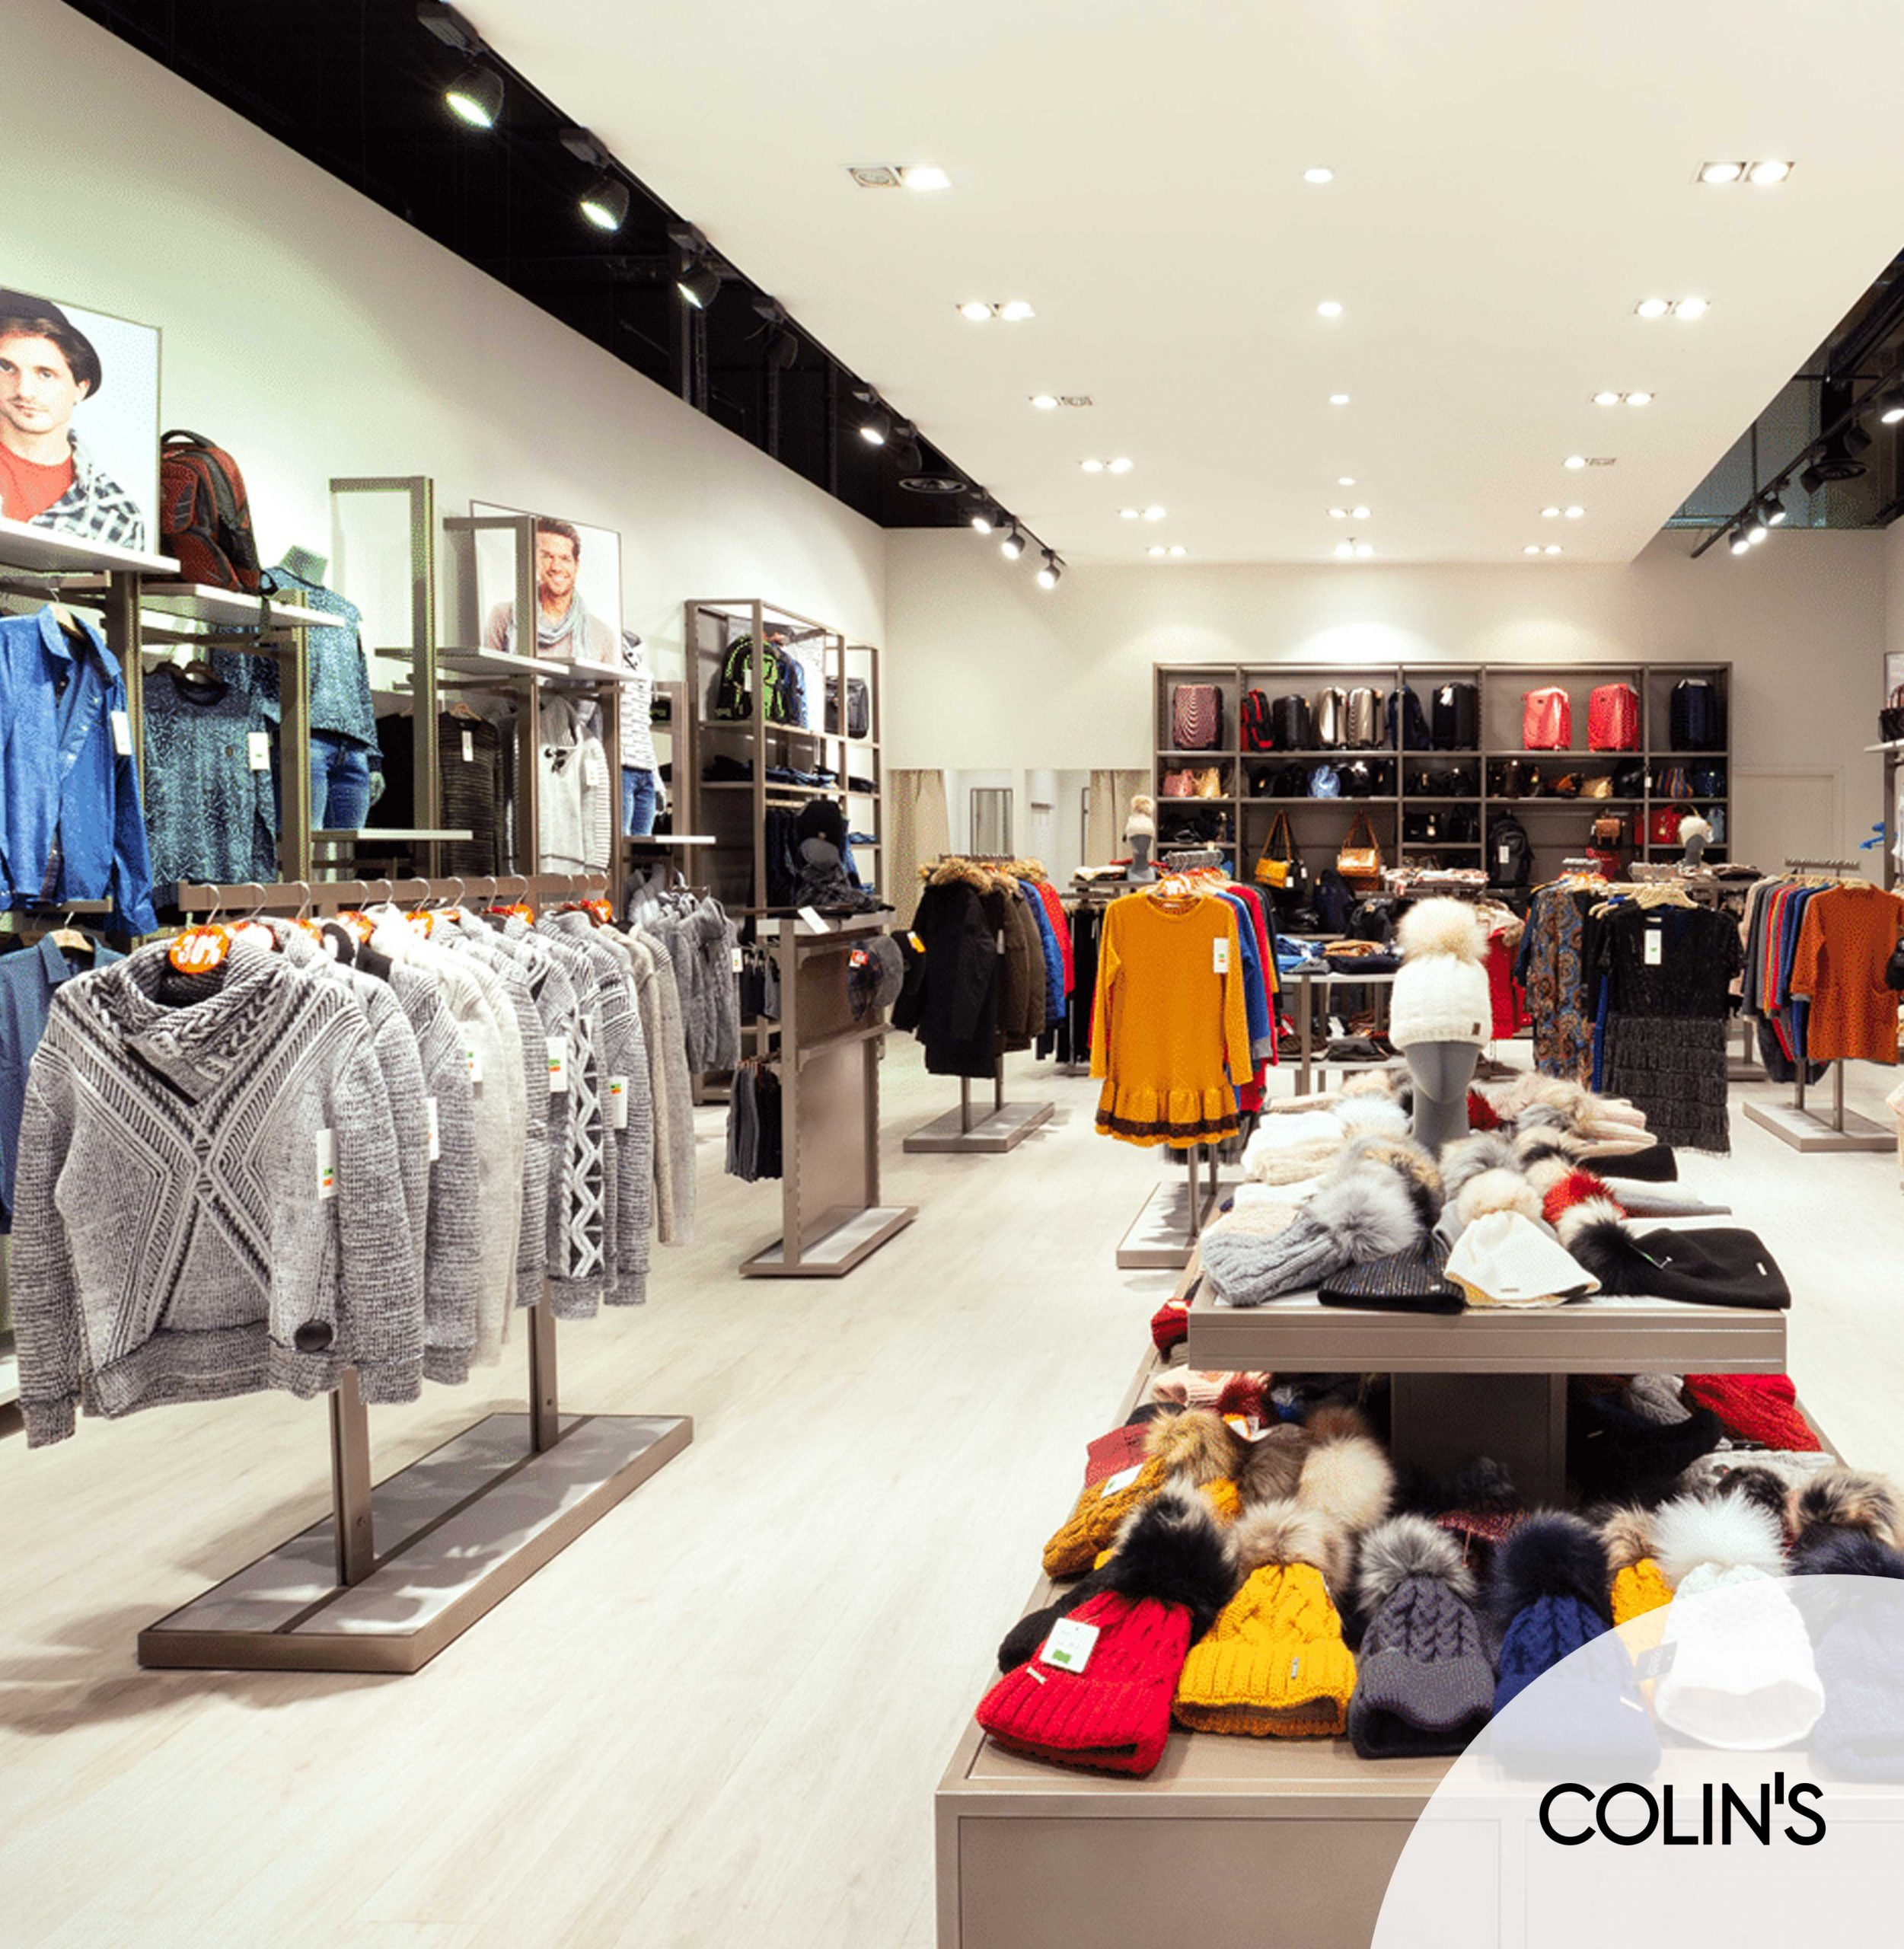 colins_1